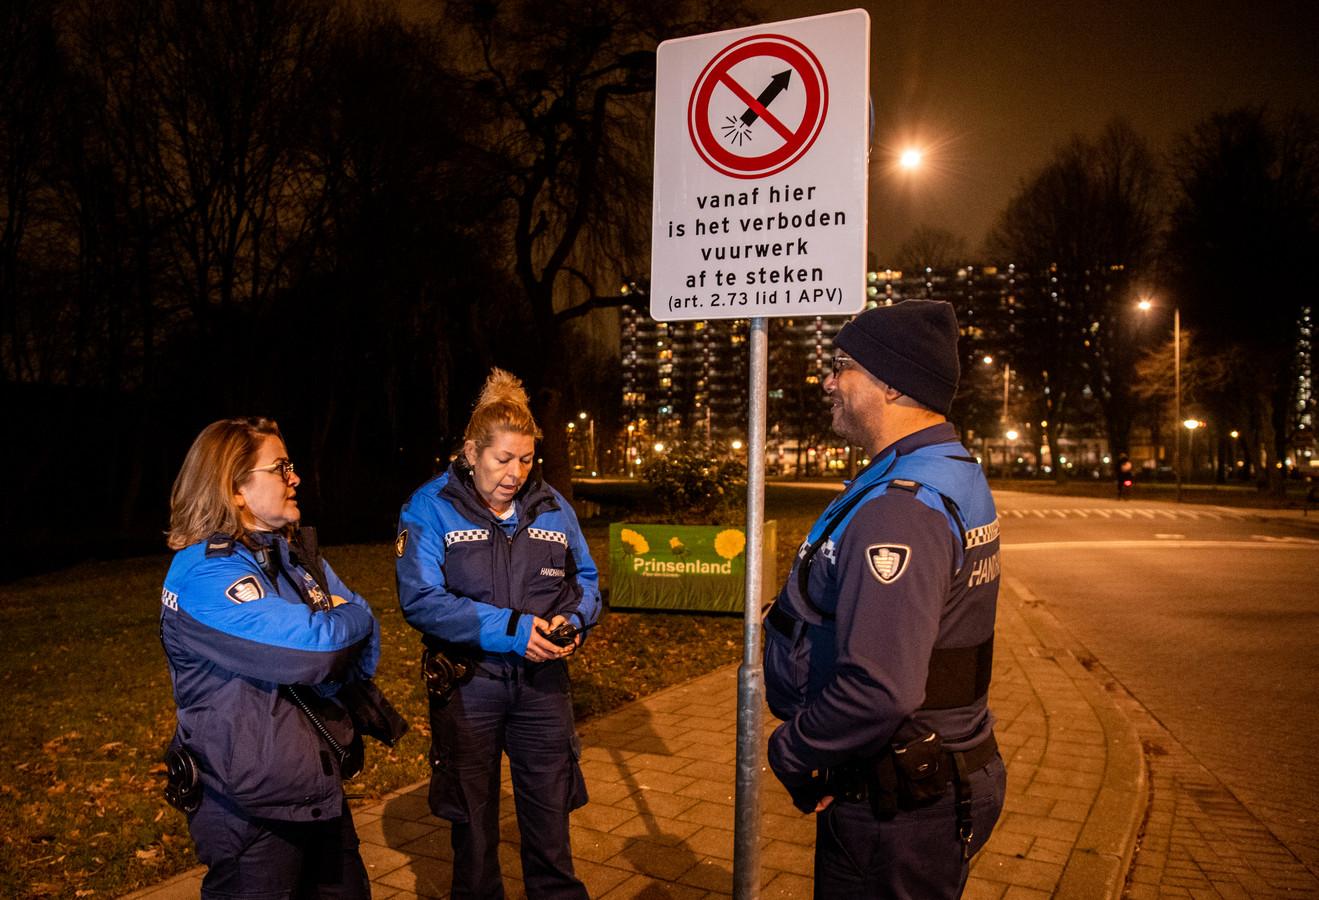 Sermin Guler, Shearron Martina en Erica van Laren in de vuurwerkvrije zone in Rotterdam Prinsenland.